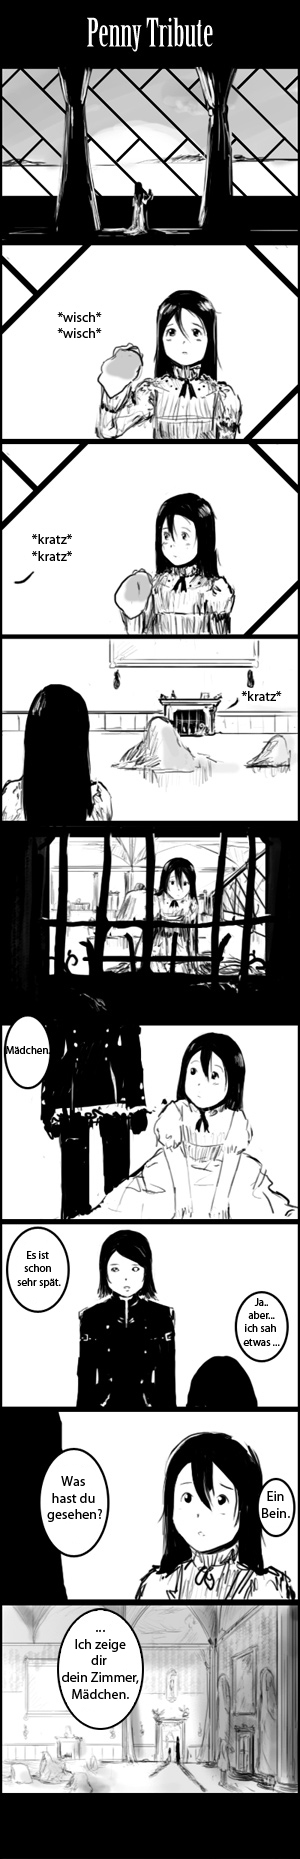 [Penny Tribute- strip 2]